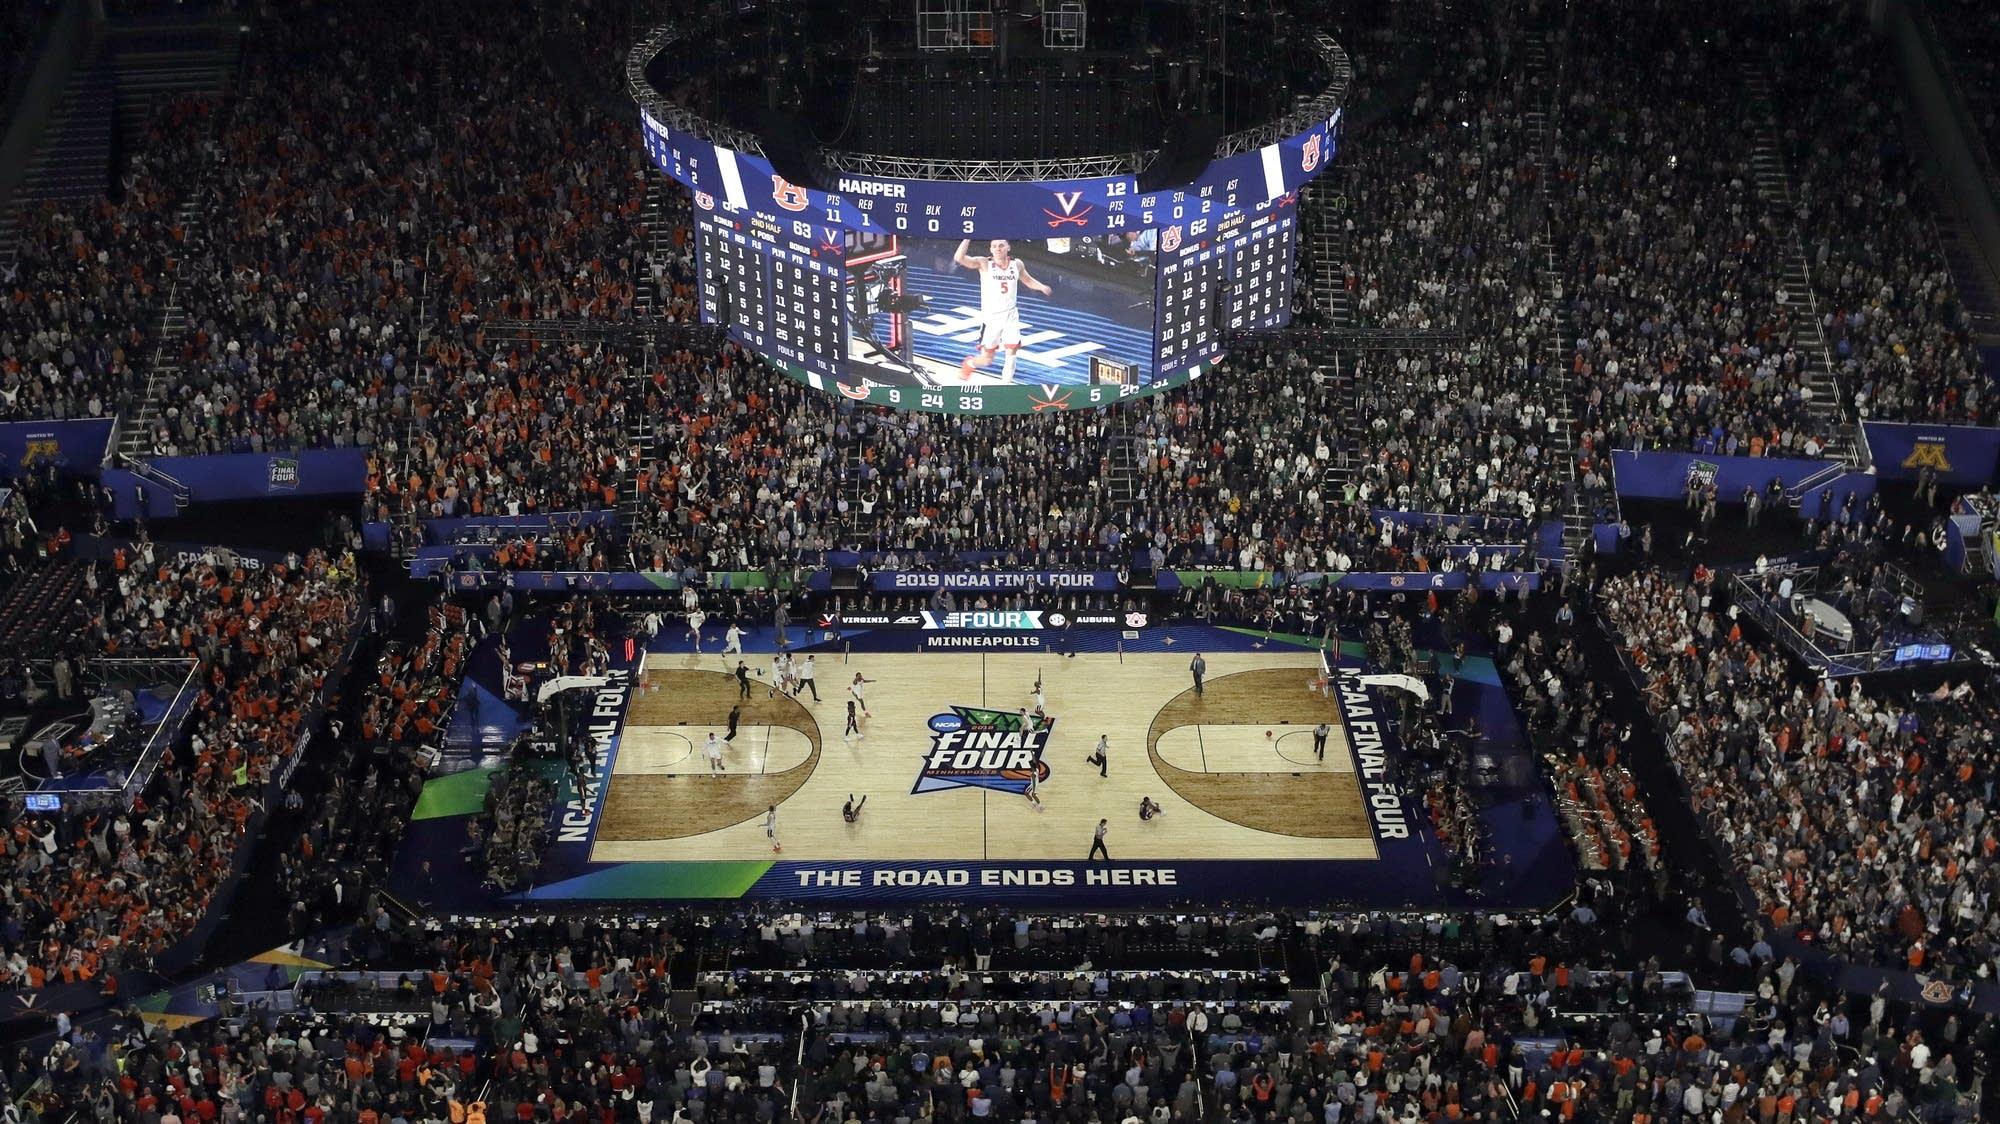 Ncaa Final Virginia Texas Tech Go For Their First National Titles Mpr News